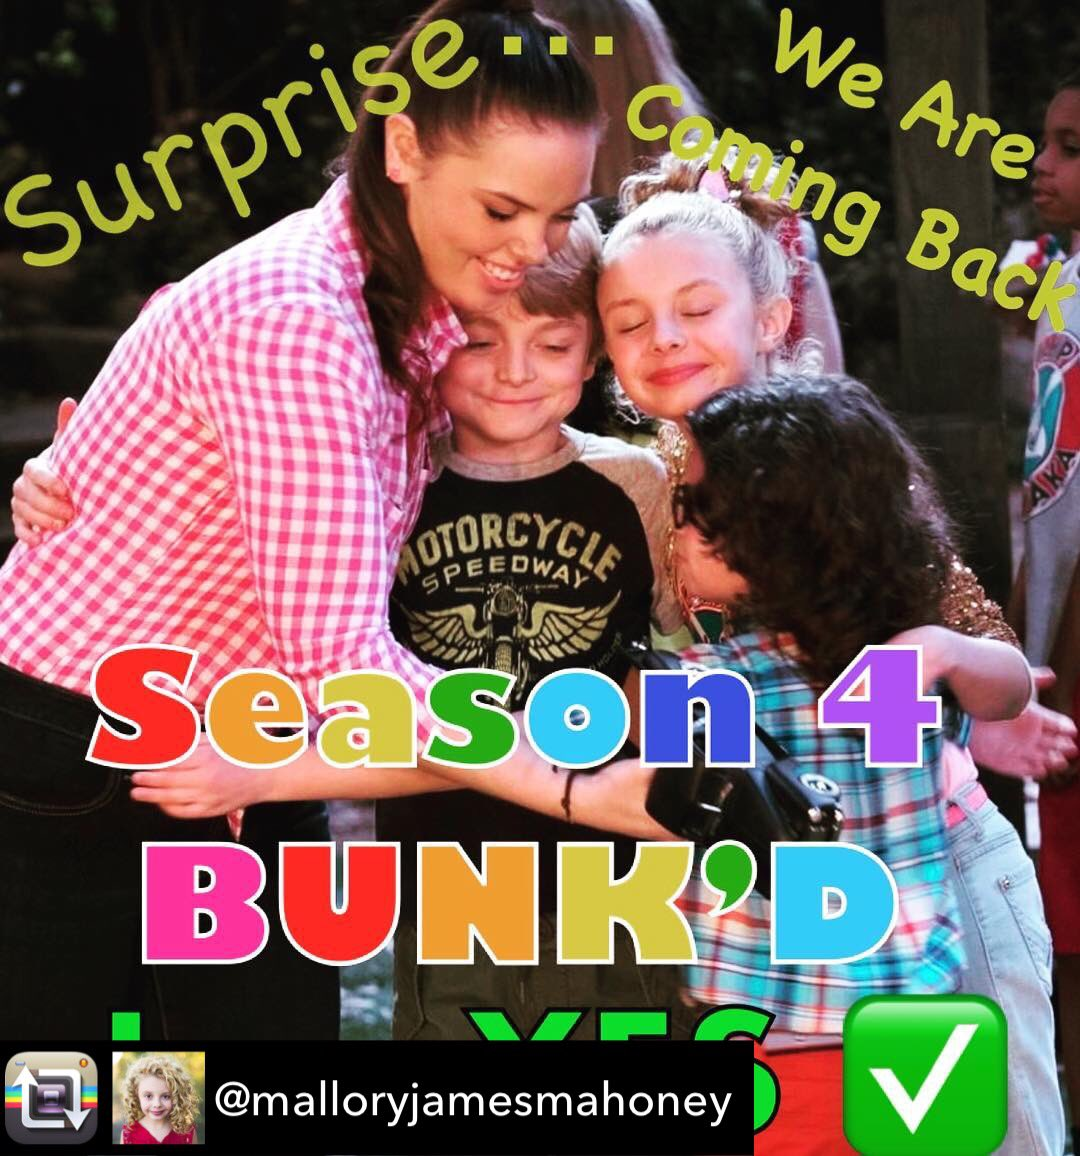 So excited for season 4! #thankyoufans #thankyoudisney